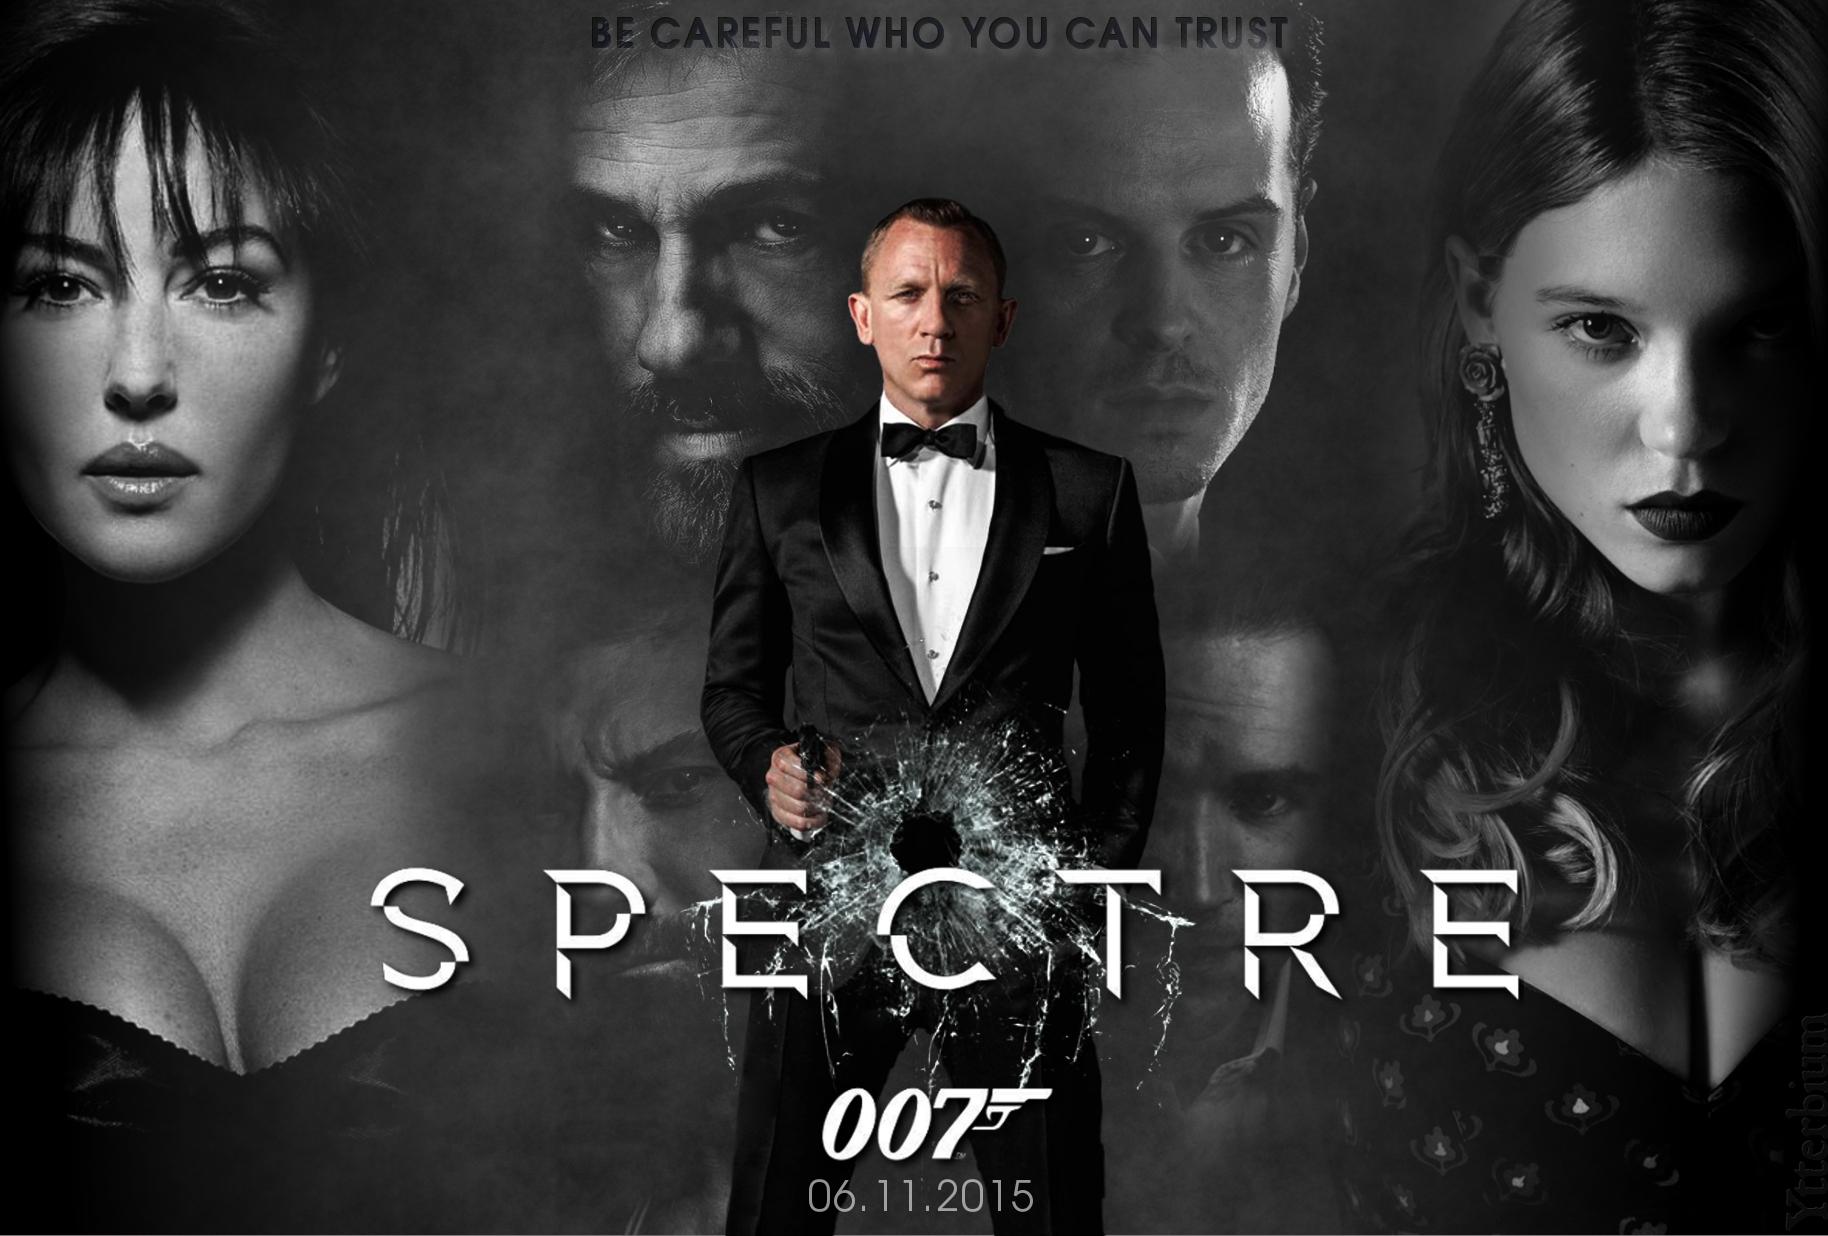 spectre1.jpg